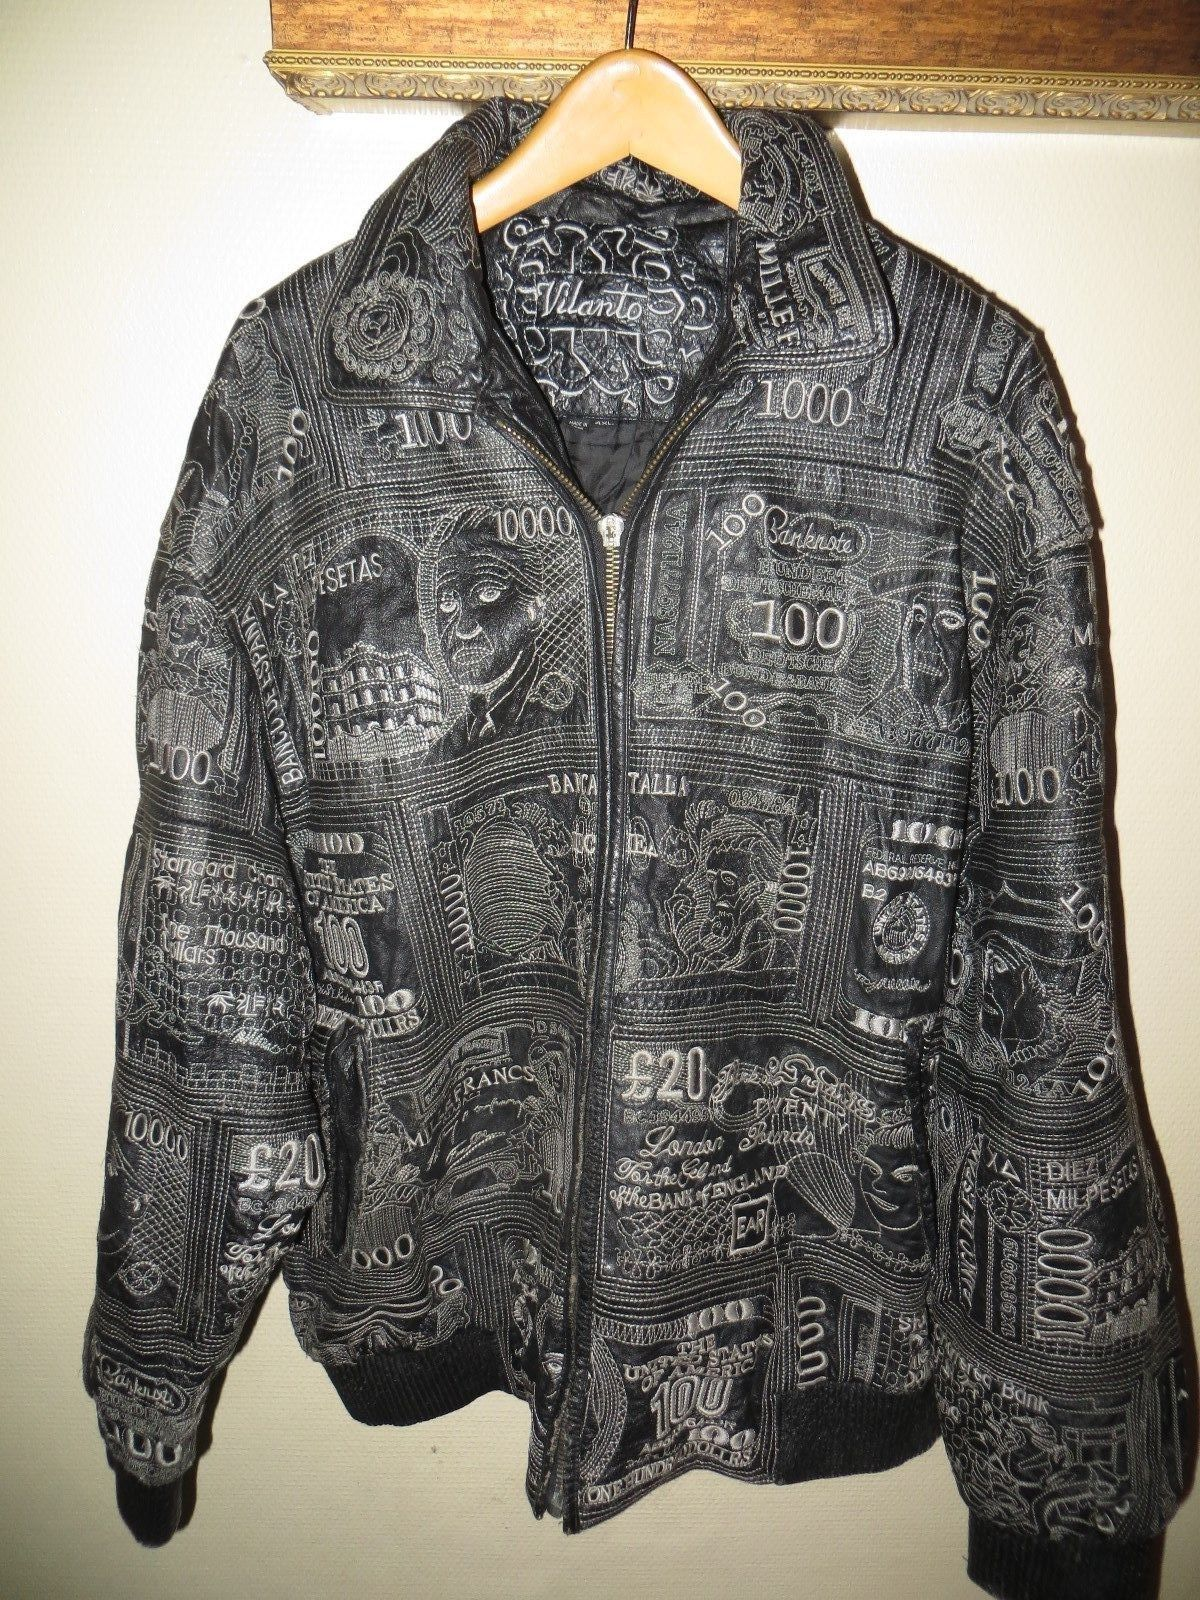 Rare Money Vilanto Men Black Embroidered Leather Flight Bomber Hip Hop Jacket 4x Flight Bomber Jacket Leather E Hip Hop Jacket Embroidered Leather Jackets [ 1600 x 1200 Pixel ]